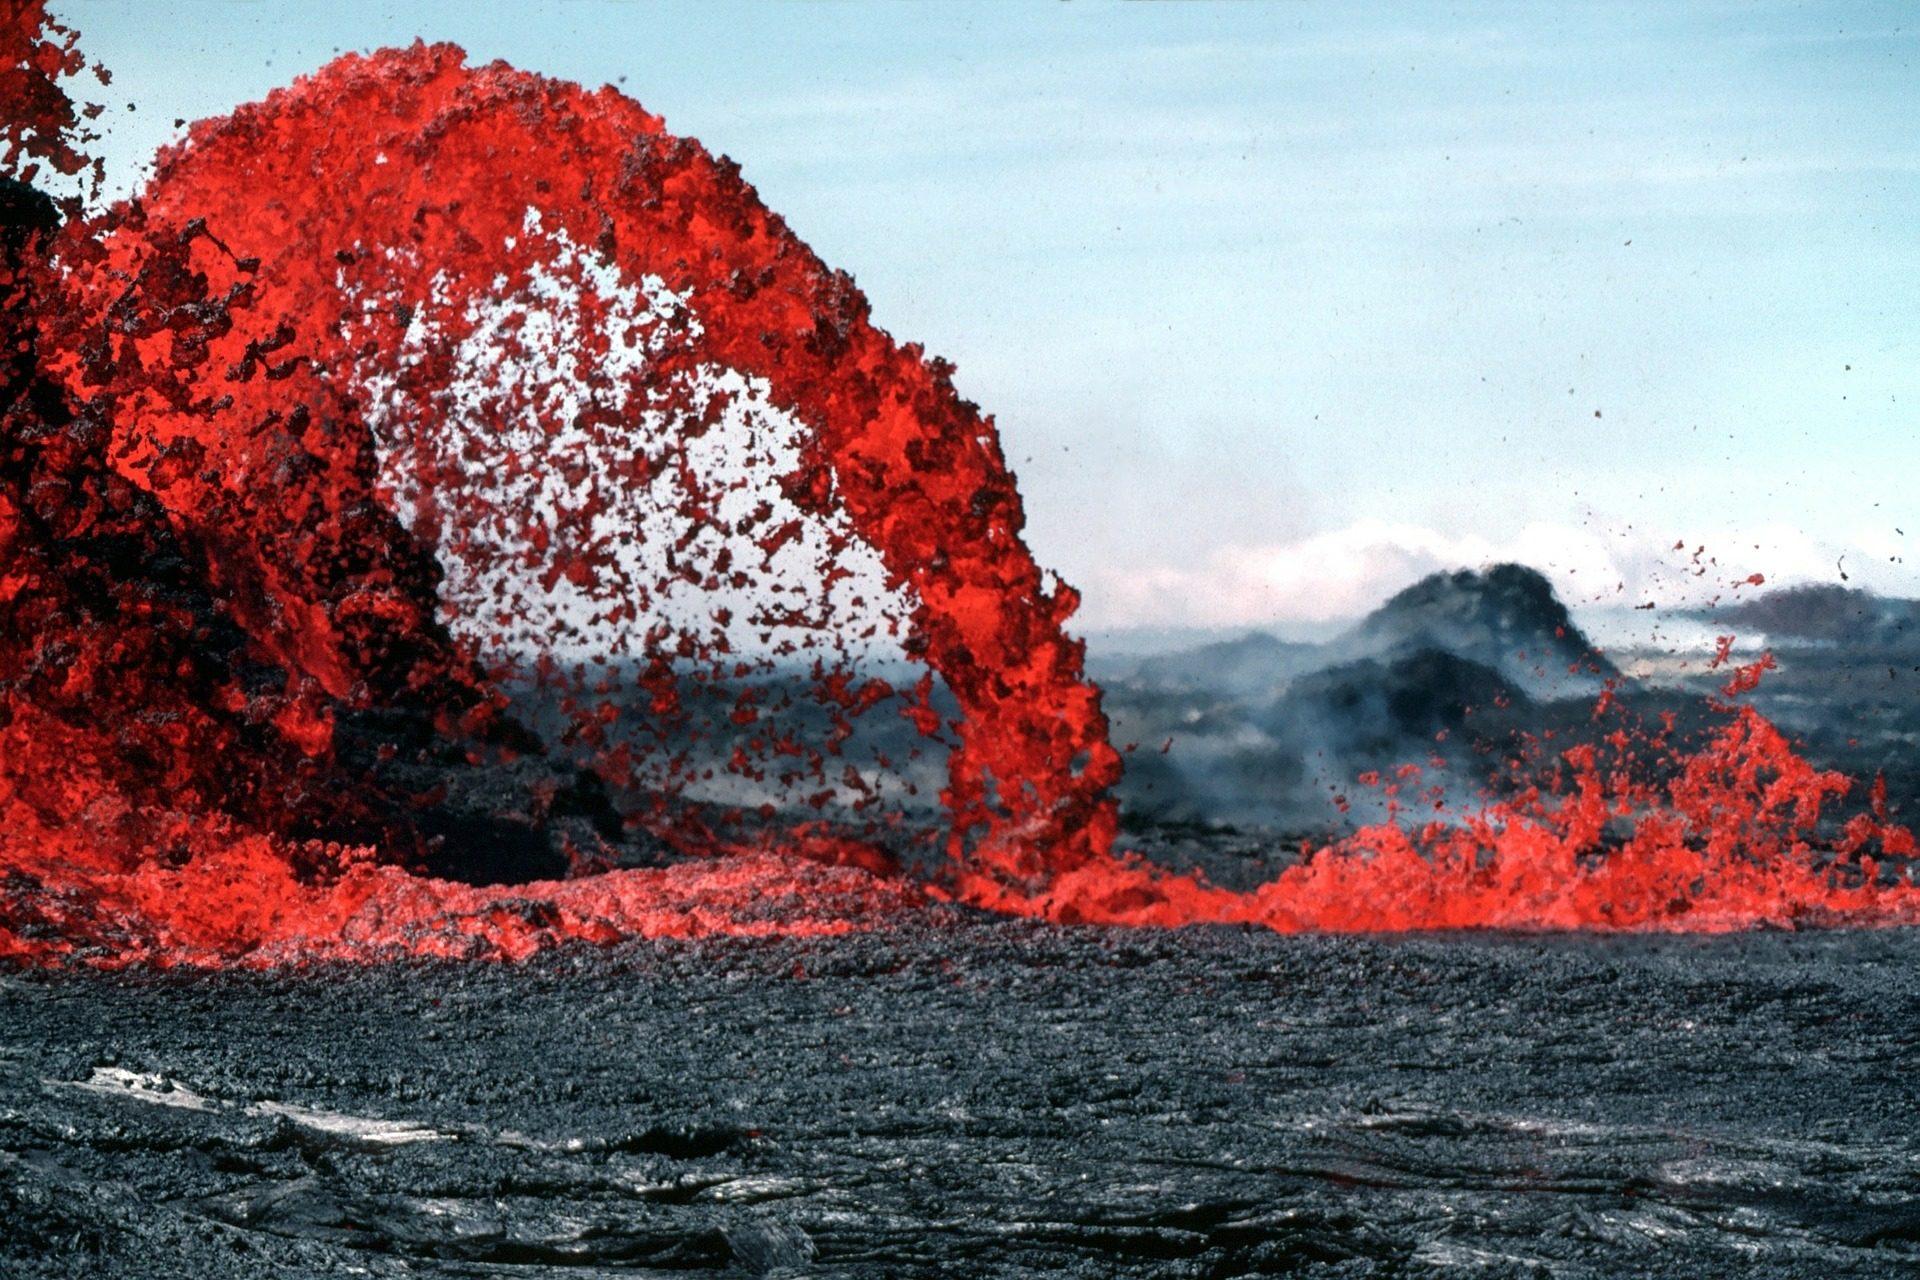 Lava, Magma, Eruption, Vulkan, Wärme, Gefahr - Wallpaper HD - Prof.-falken.com